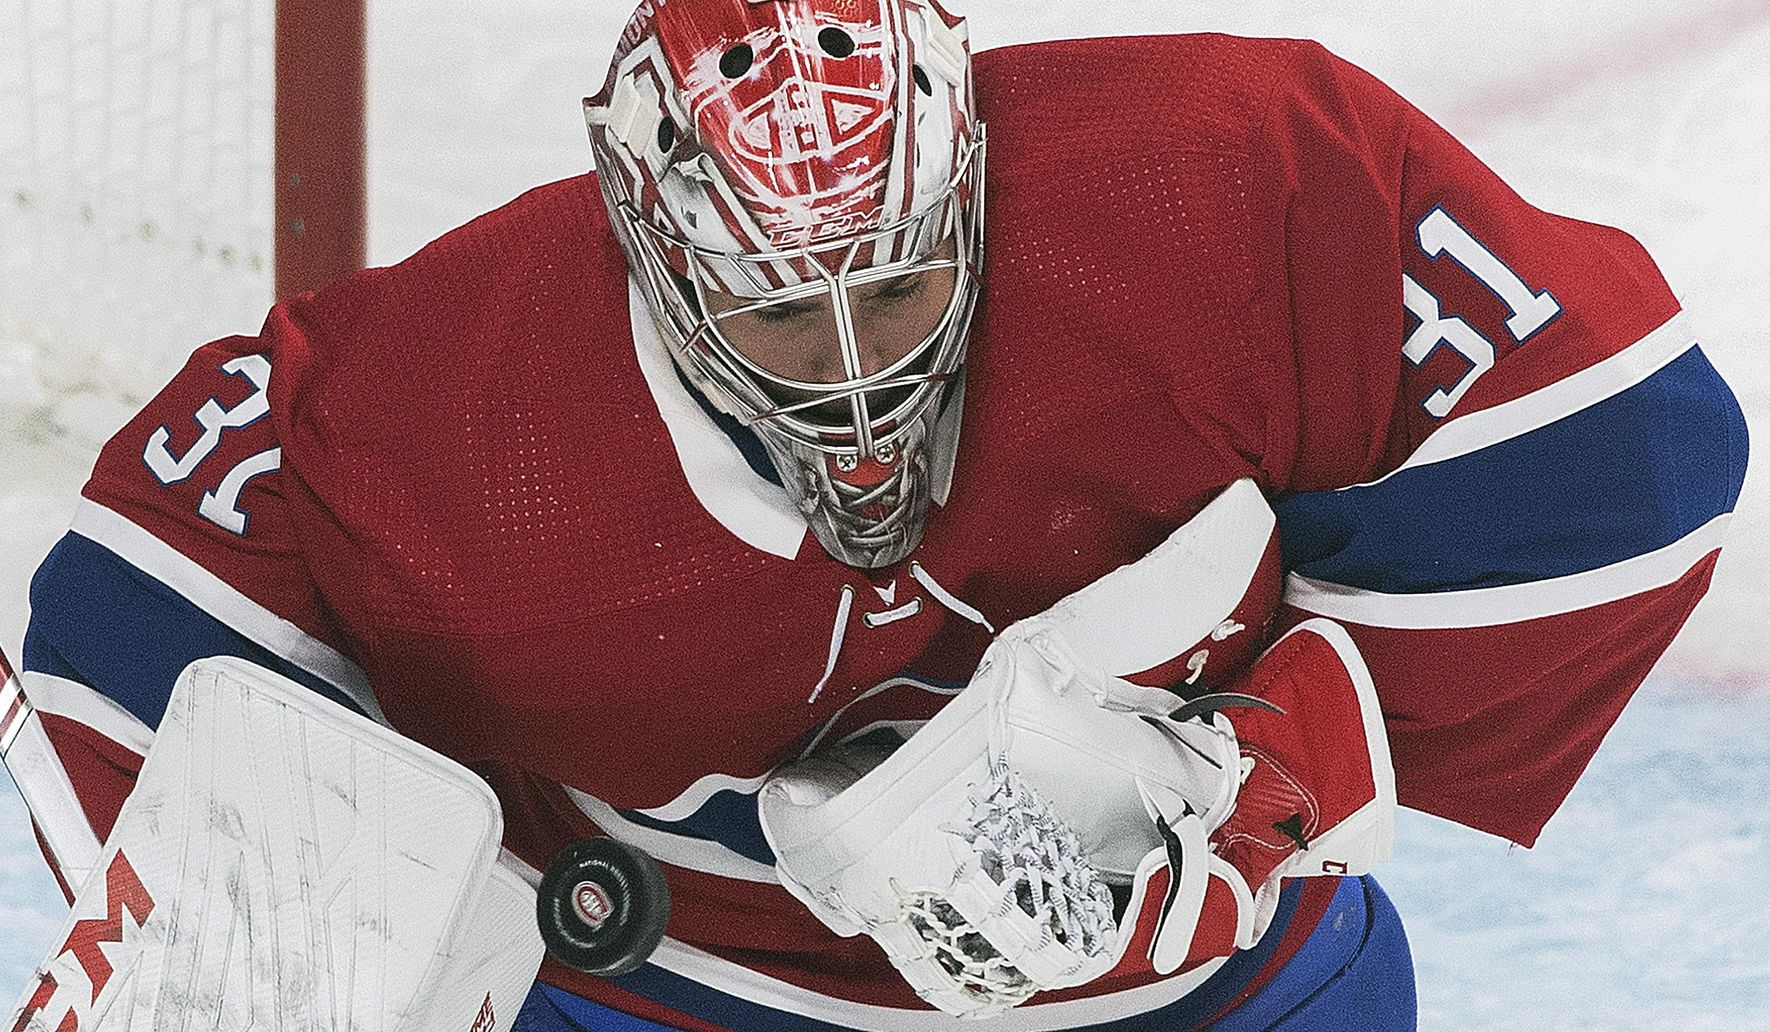 Red_wings_canadiens_hockey_73319_c0-141-3000-1890_s1770x1032